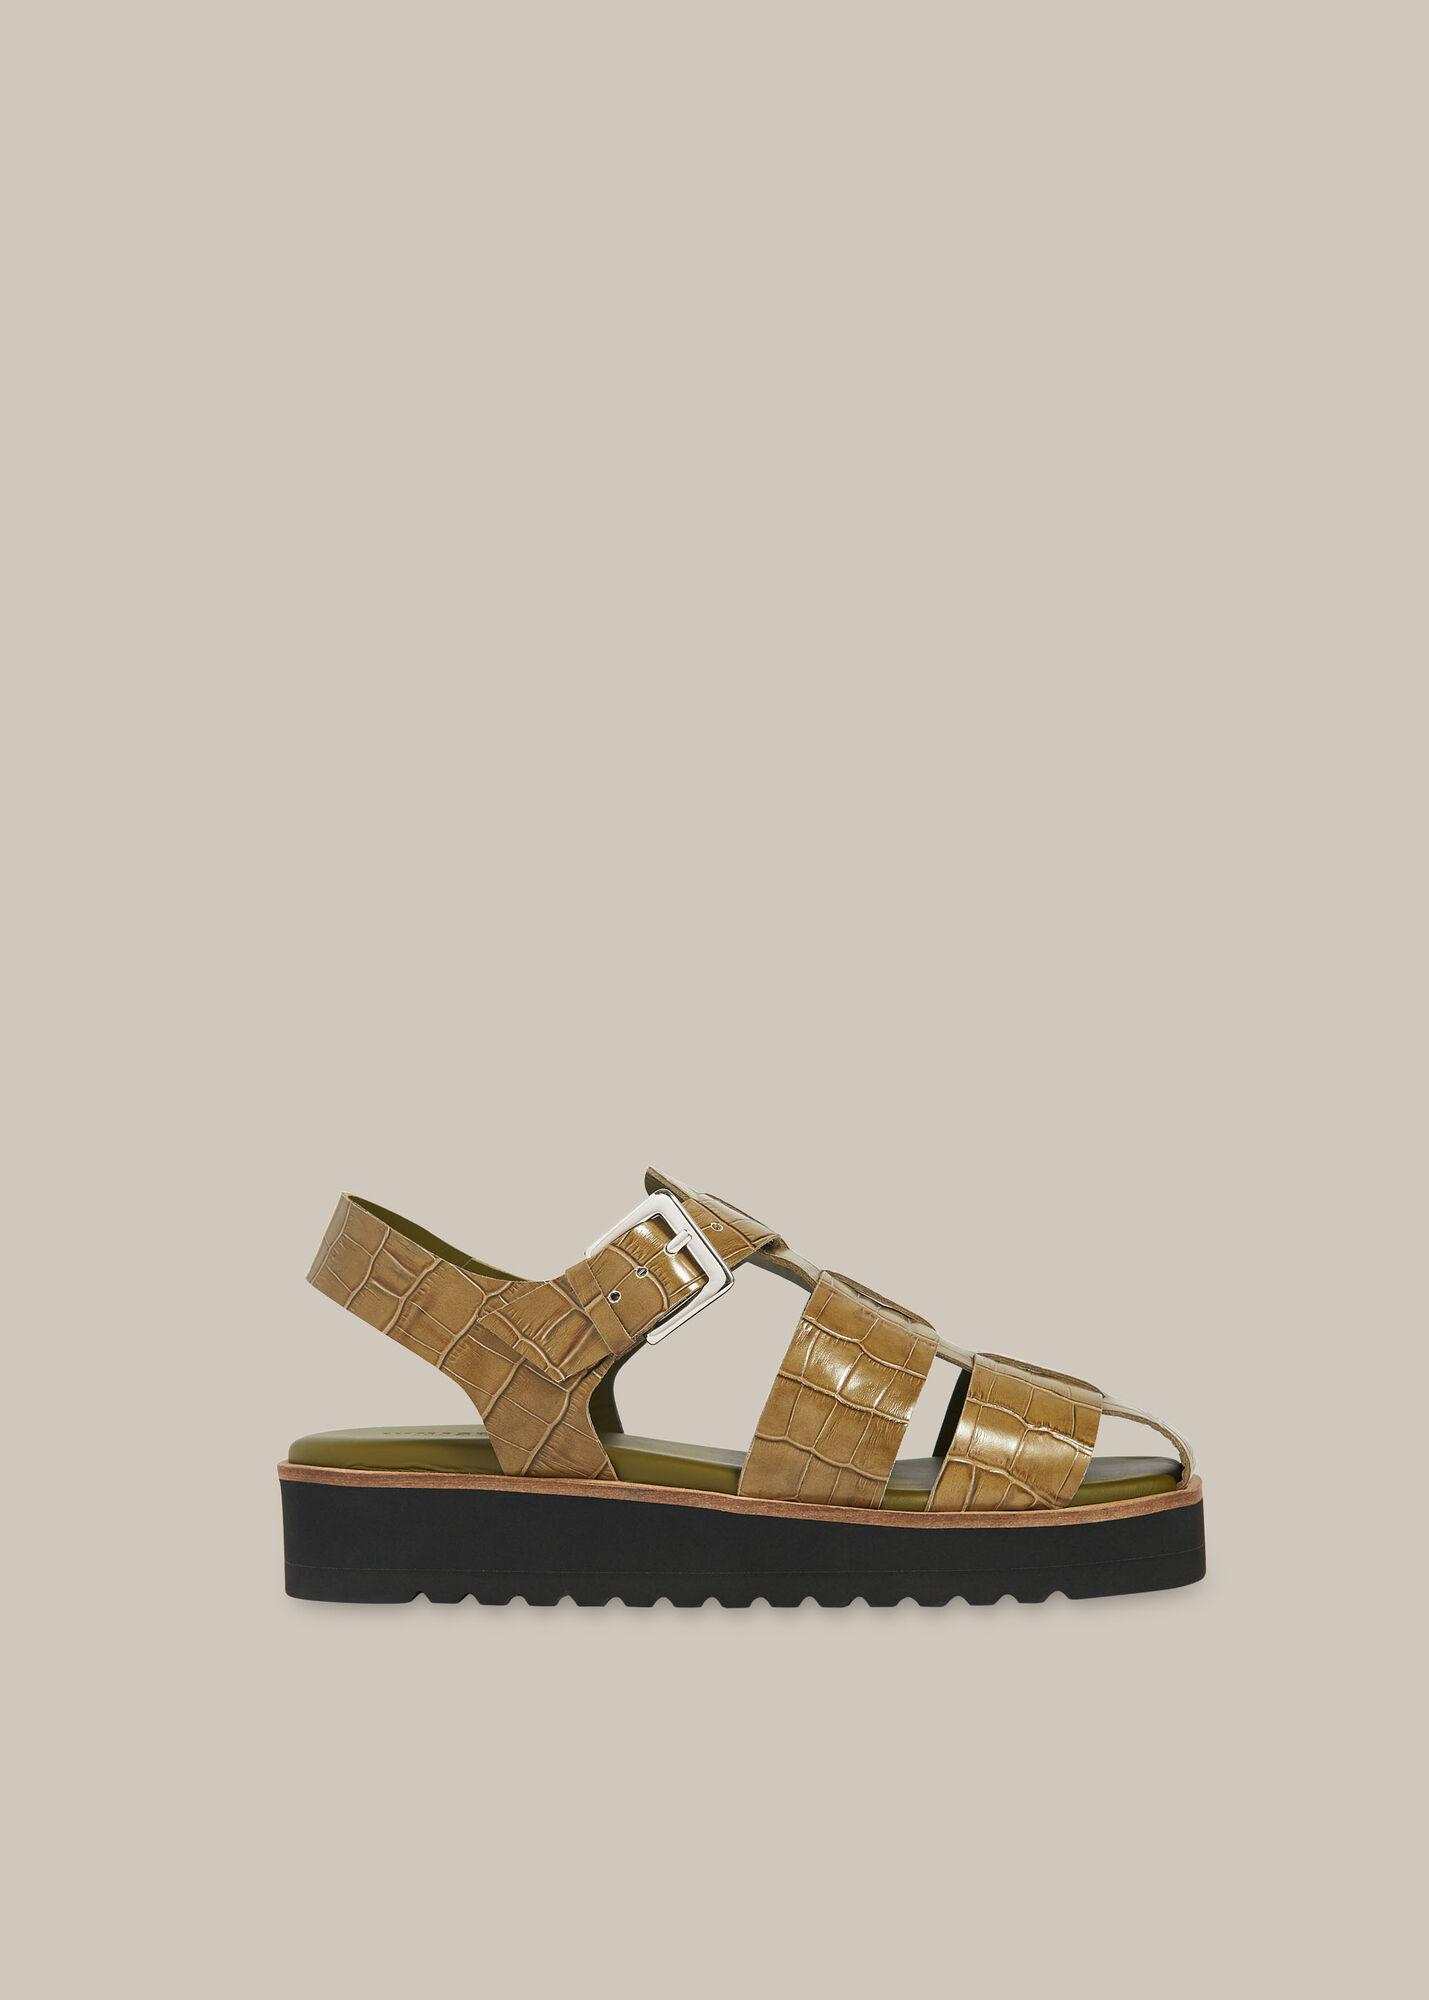 Best summer sandals 2020